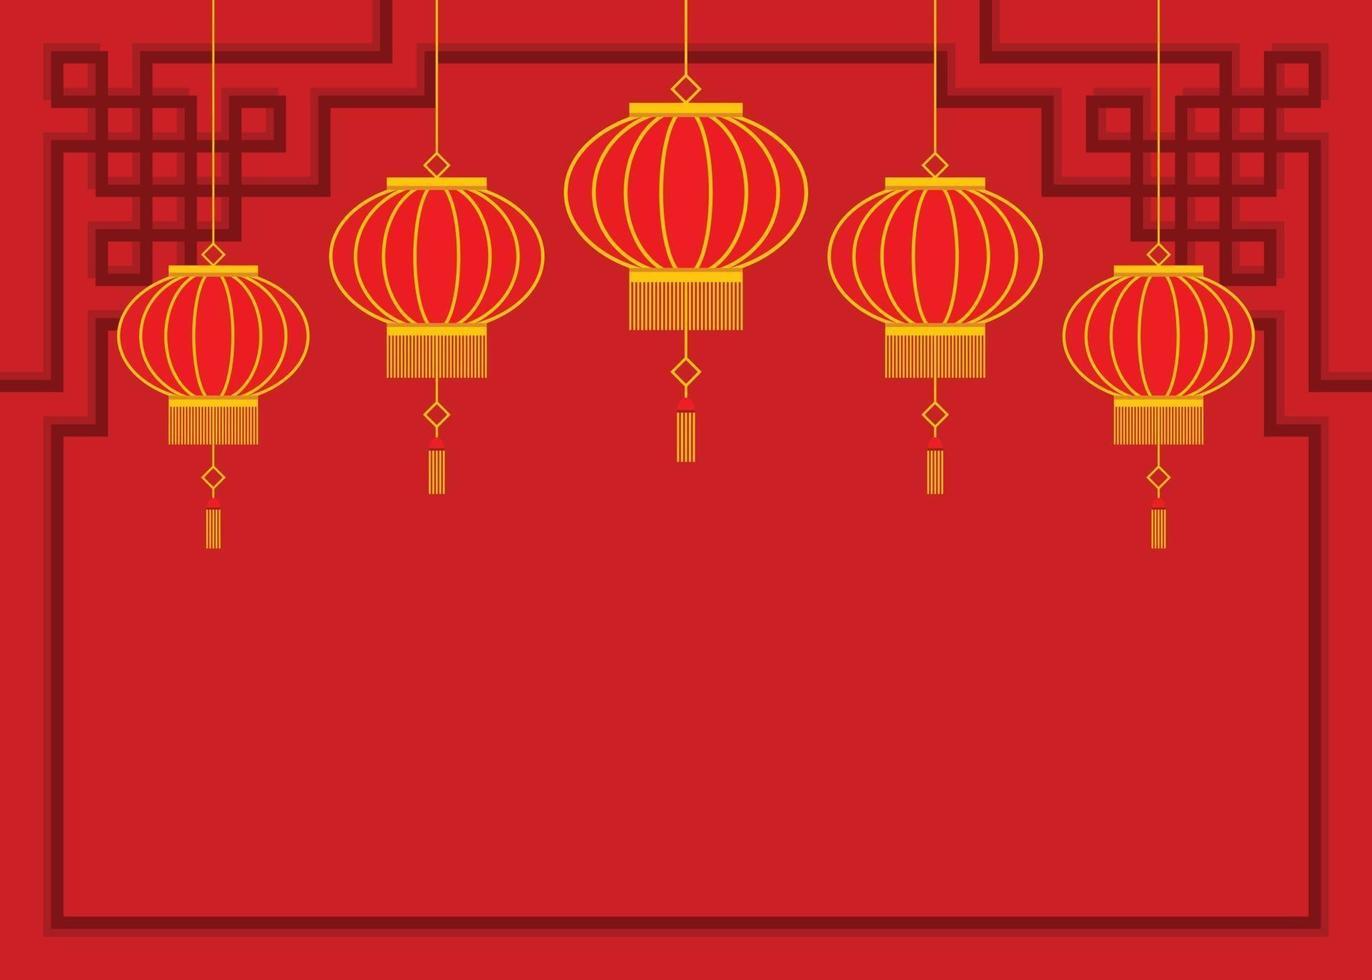 röd tapet av kinesiska lyktor. vektor